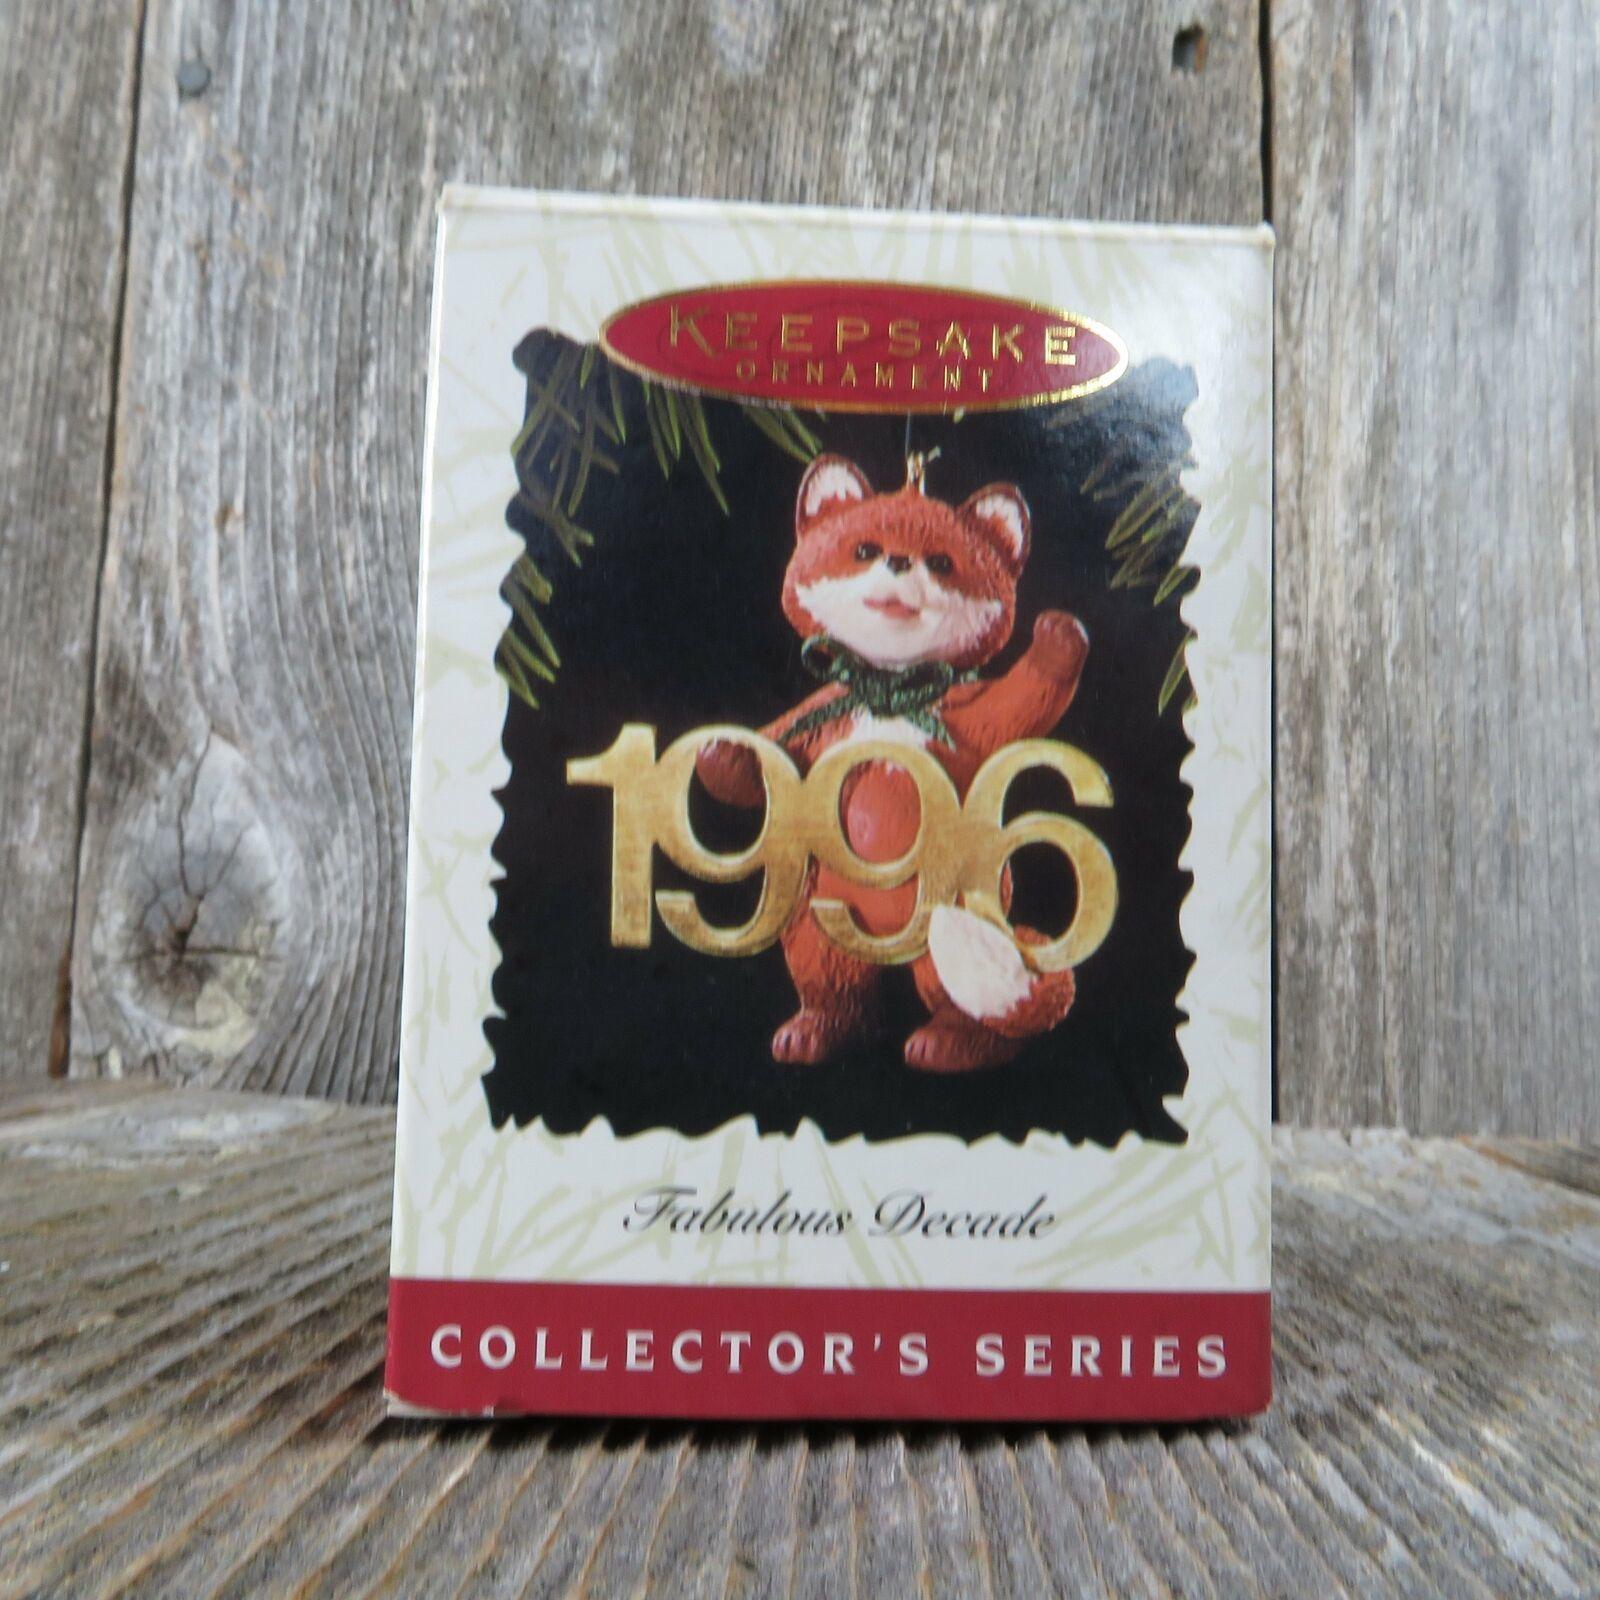 Vintage Red Fox Hallmark Keepsake Christmas Ornament 1996 Fabulous Decade image 8